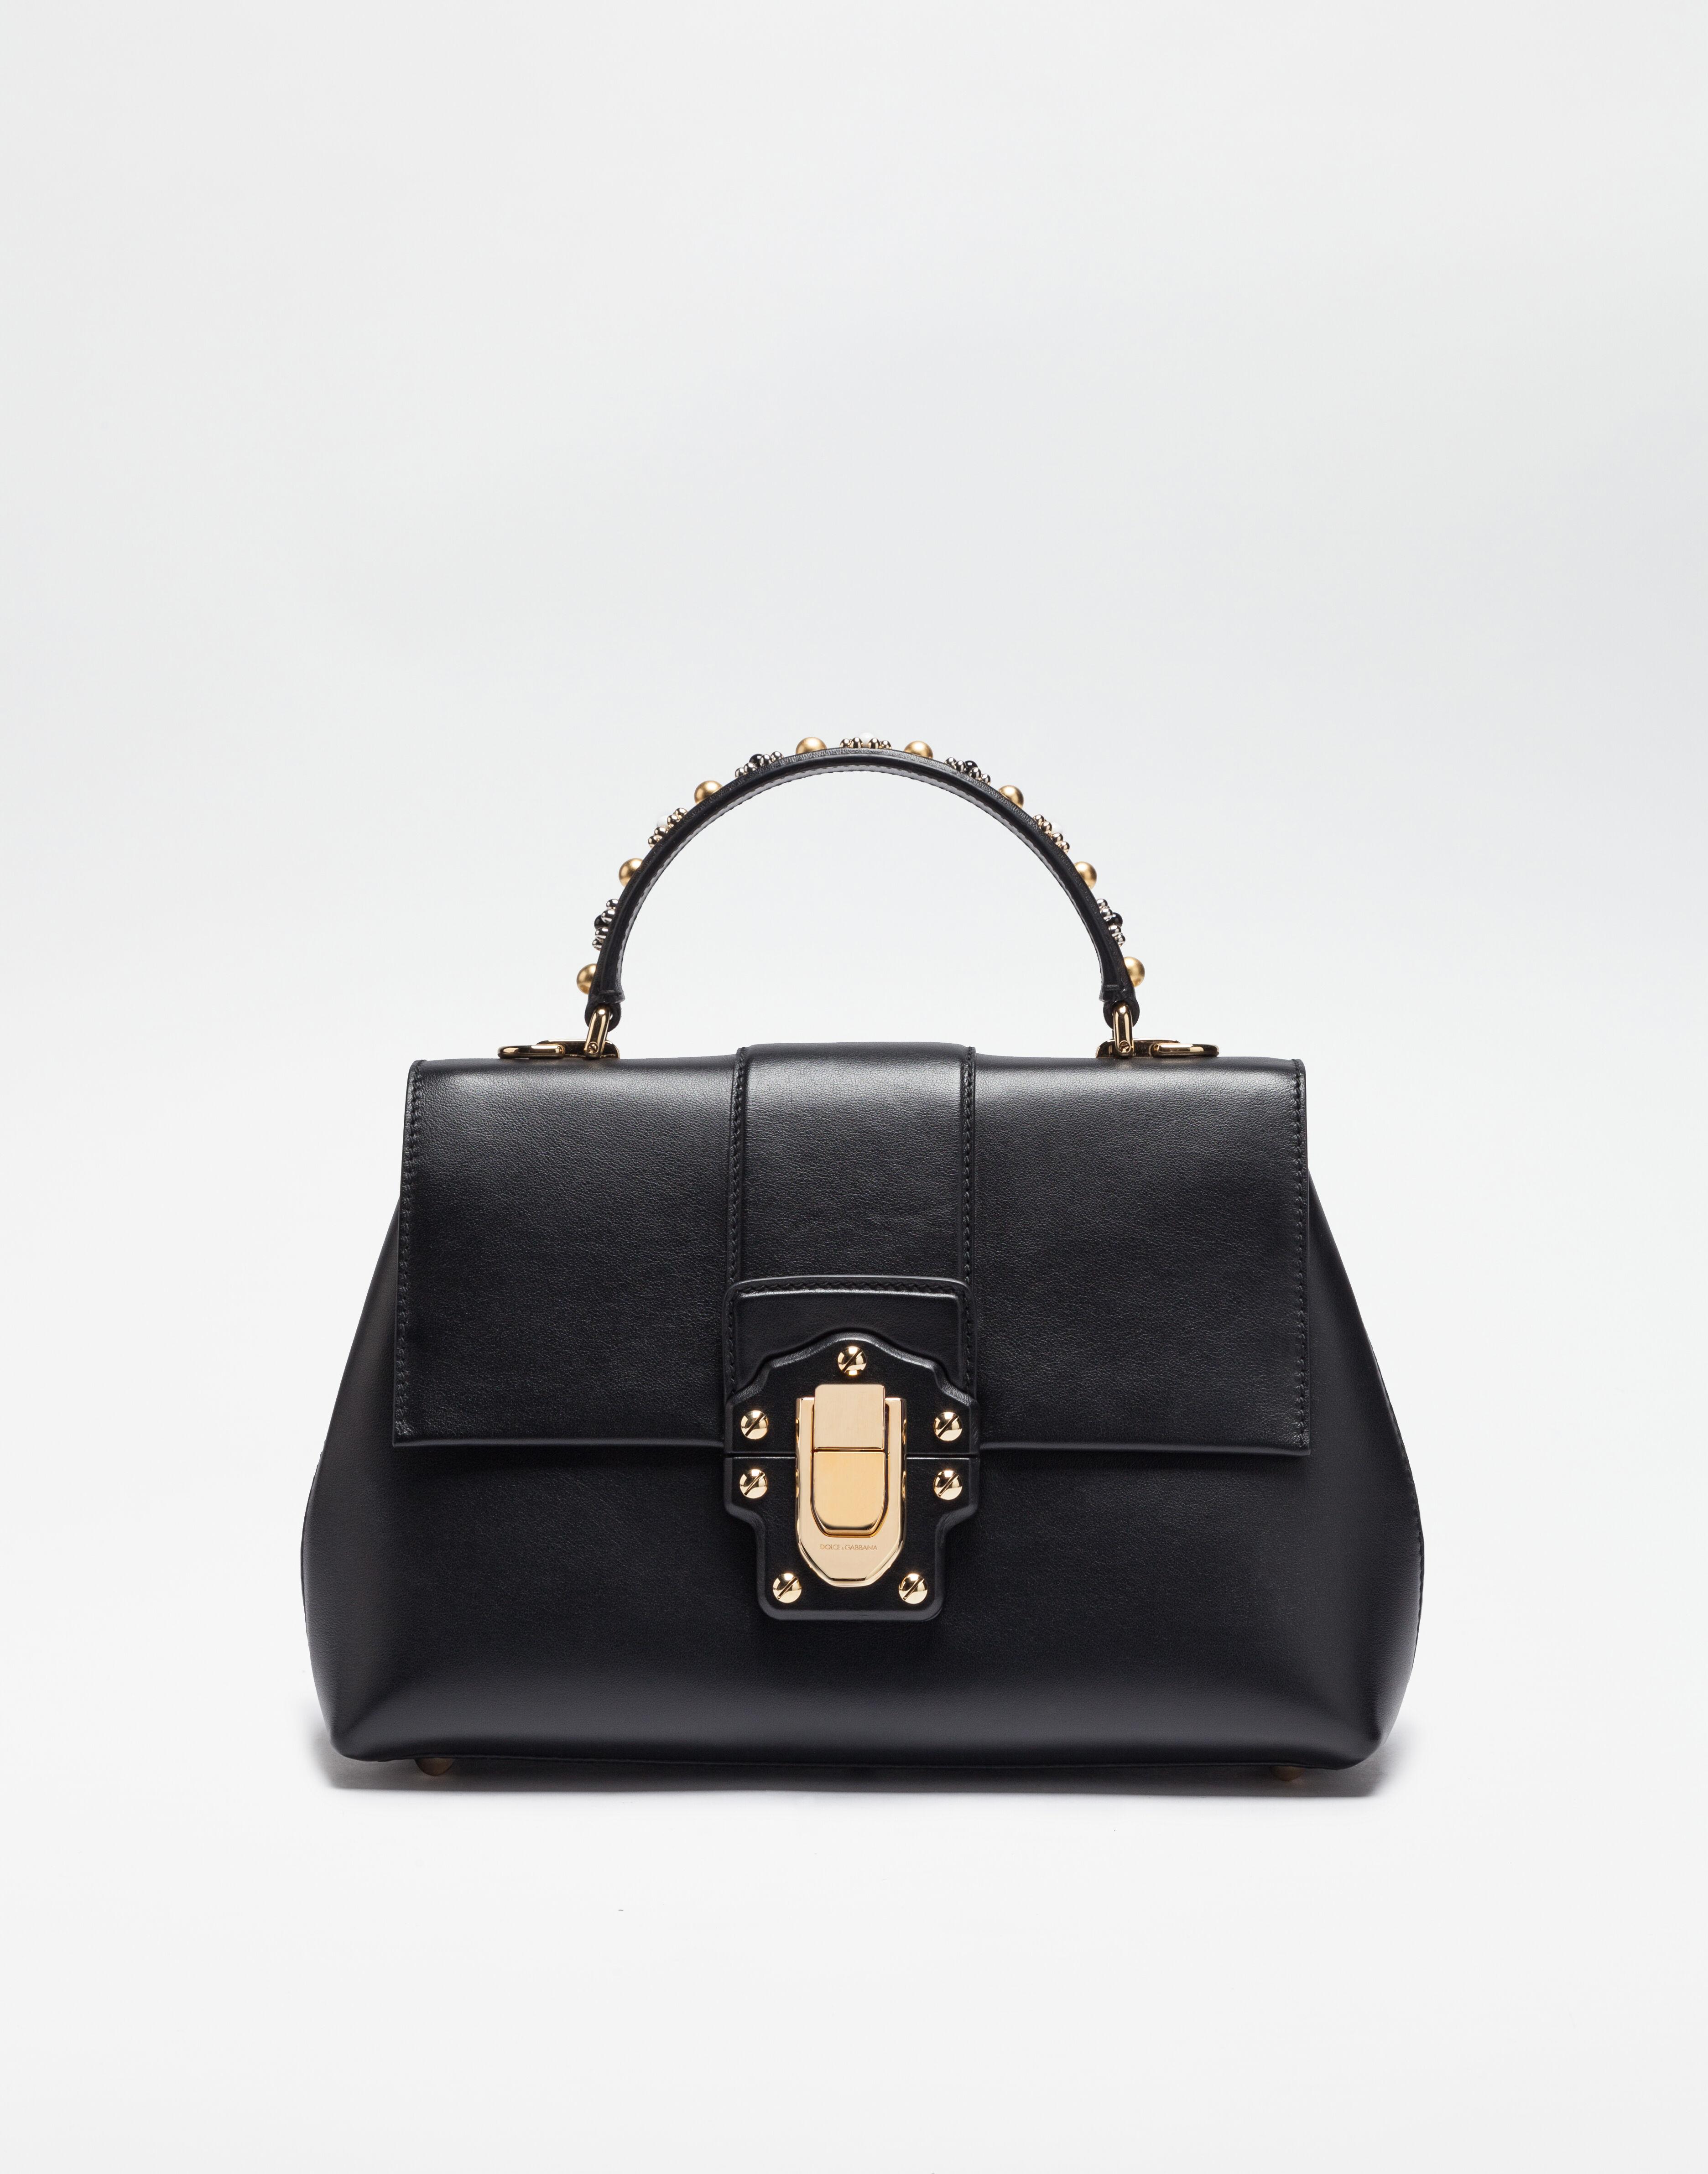 Dolce & Gabbana 'Lucia' bag Outlet Cheap Prices 100% Original Online Buy Cheap Popular Orange 100% Original High Quality Buy Online zENHx9R